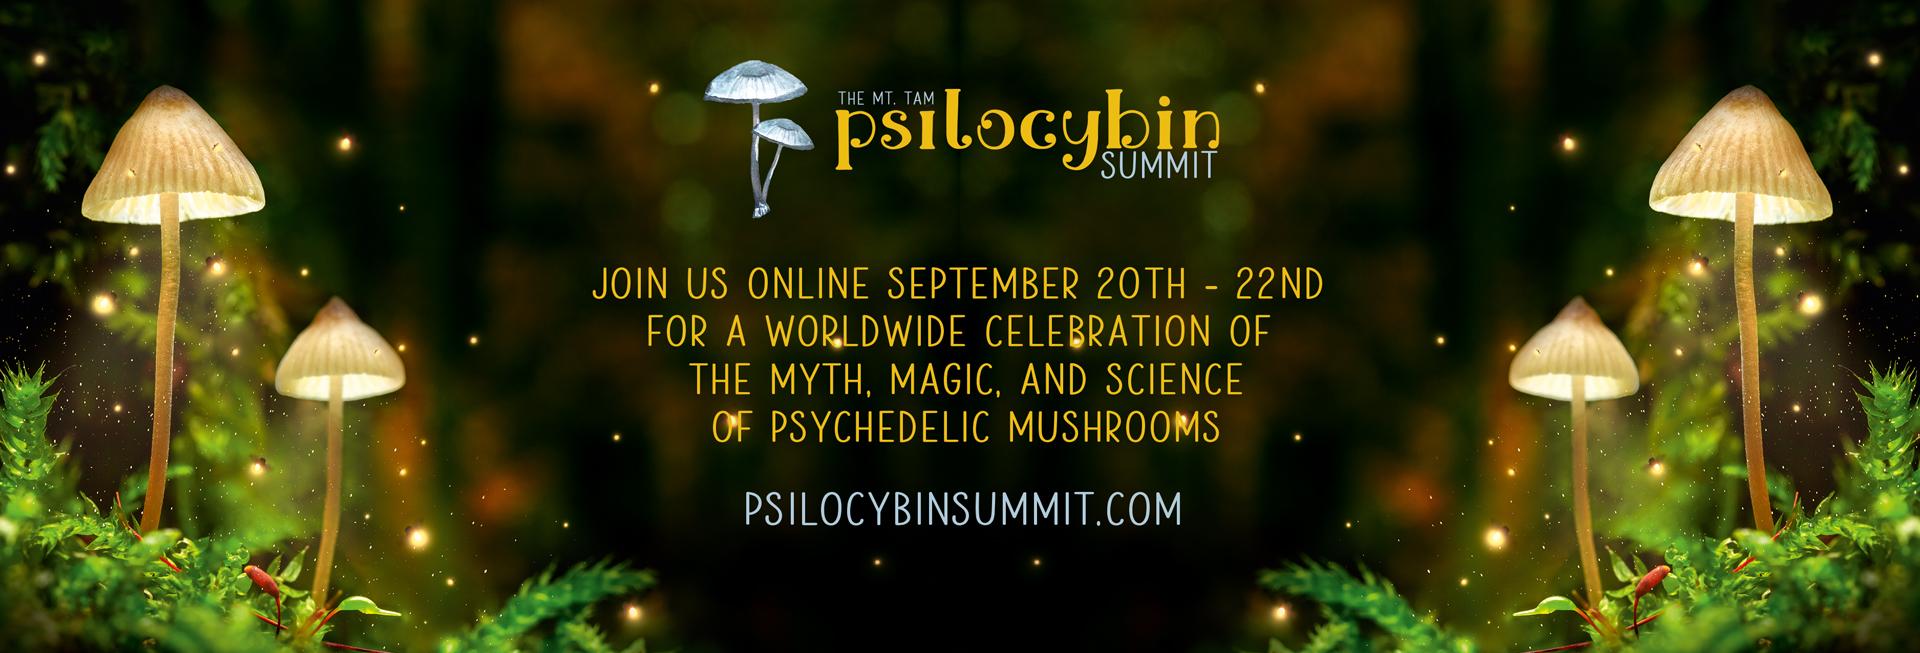 psilocybin-summit-web-banner-sm